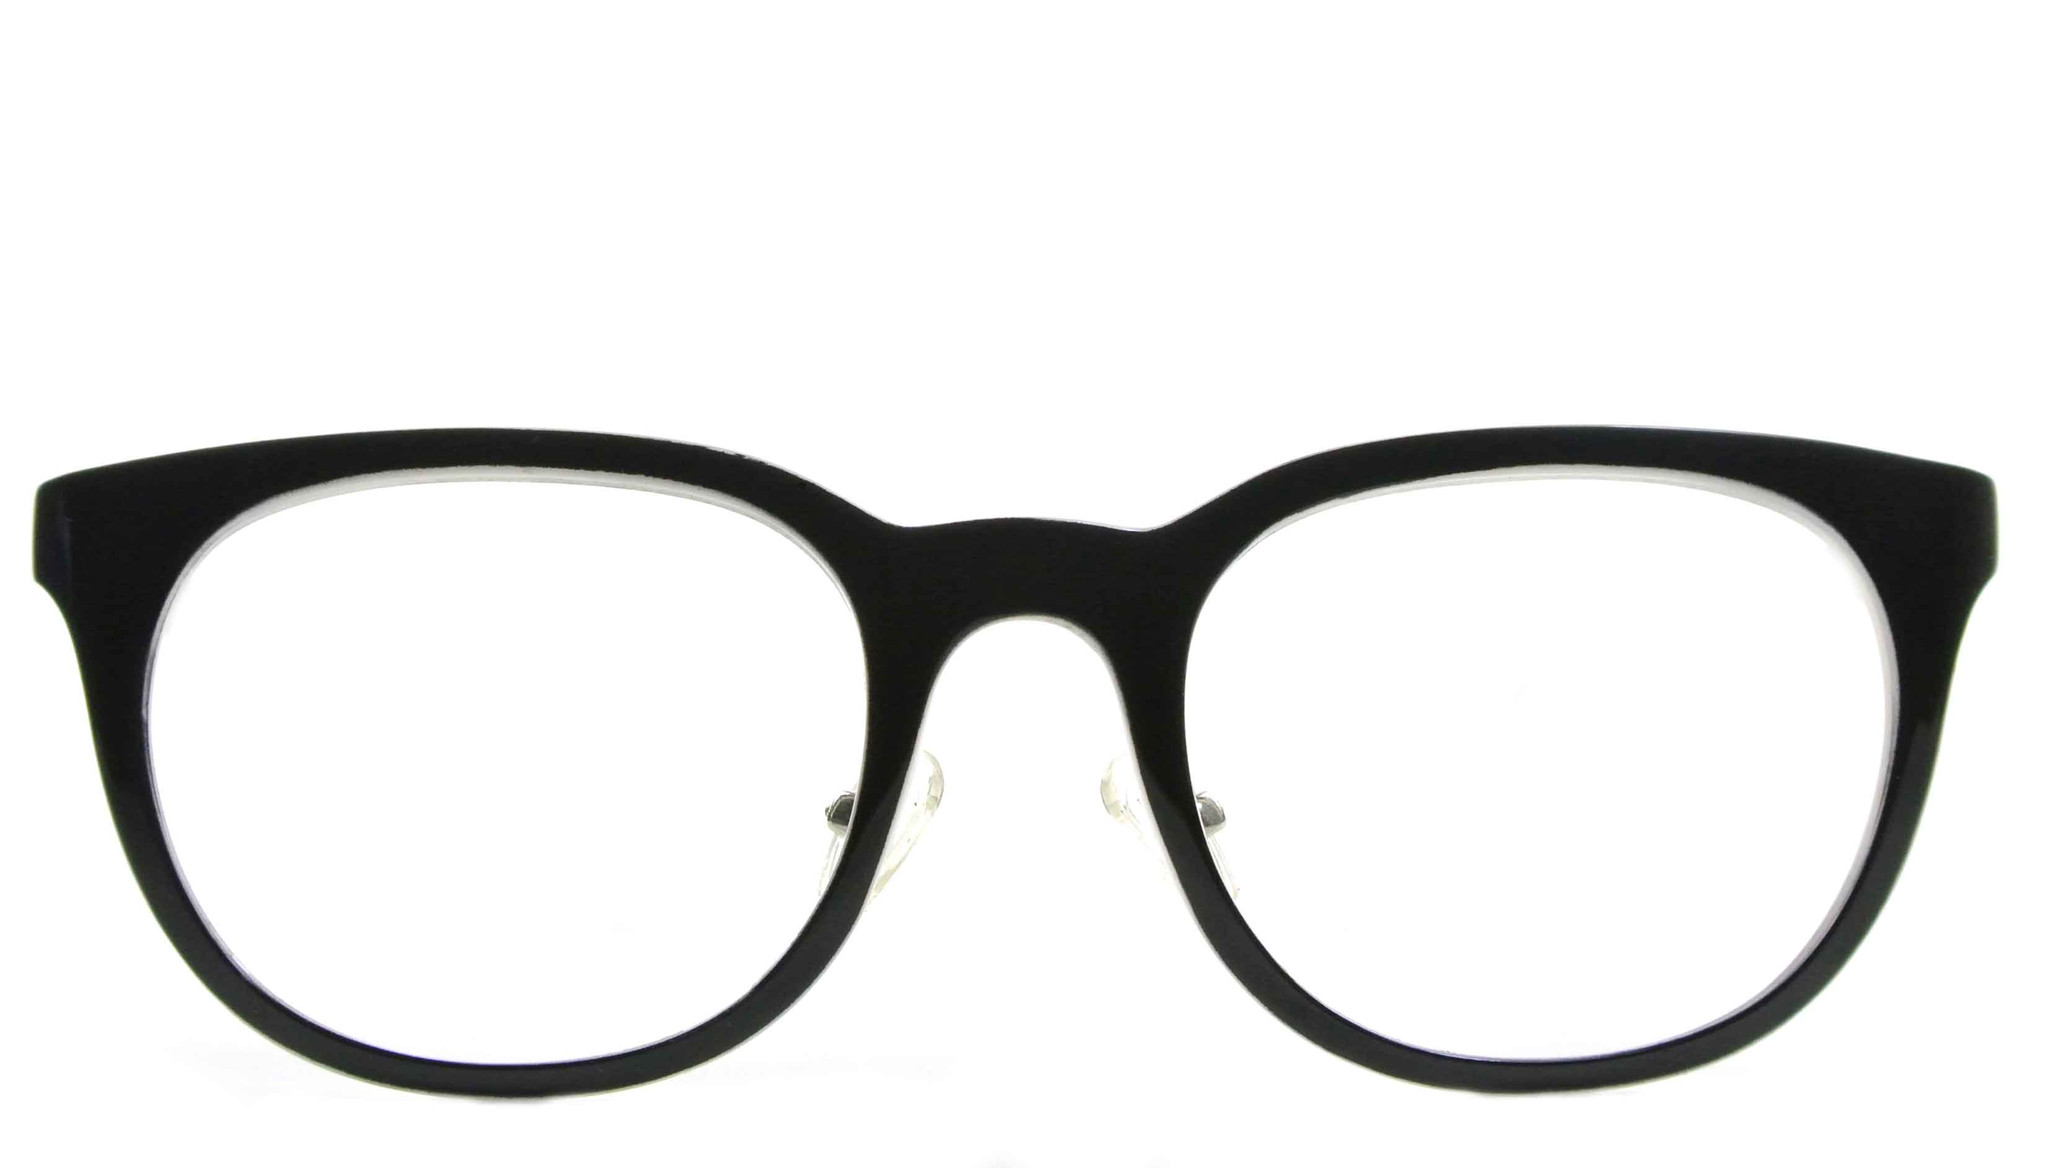 Nerd glasses clipart clip art library 3